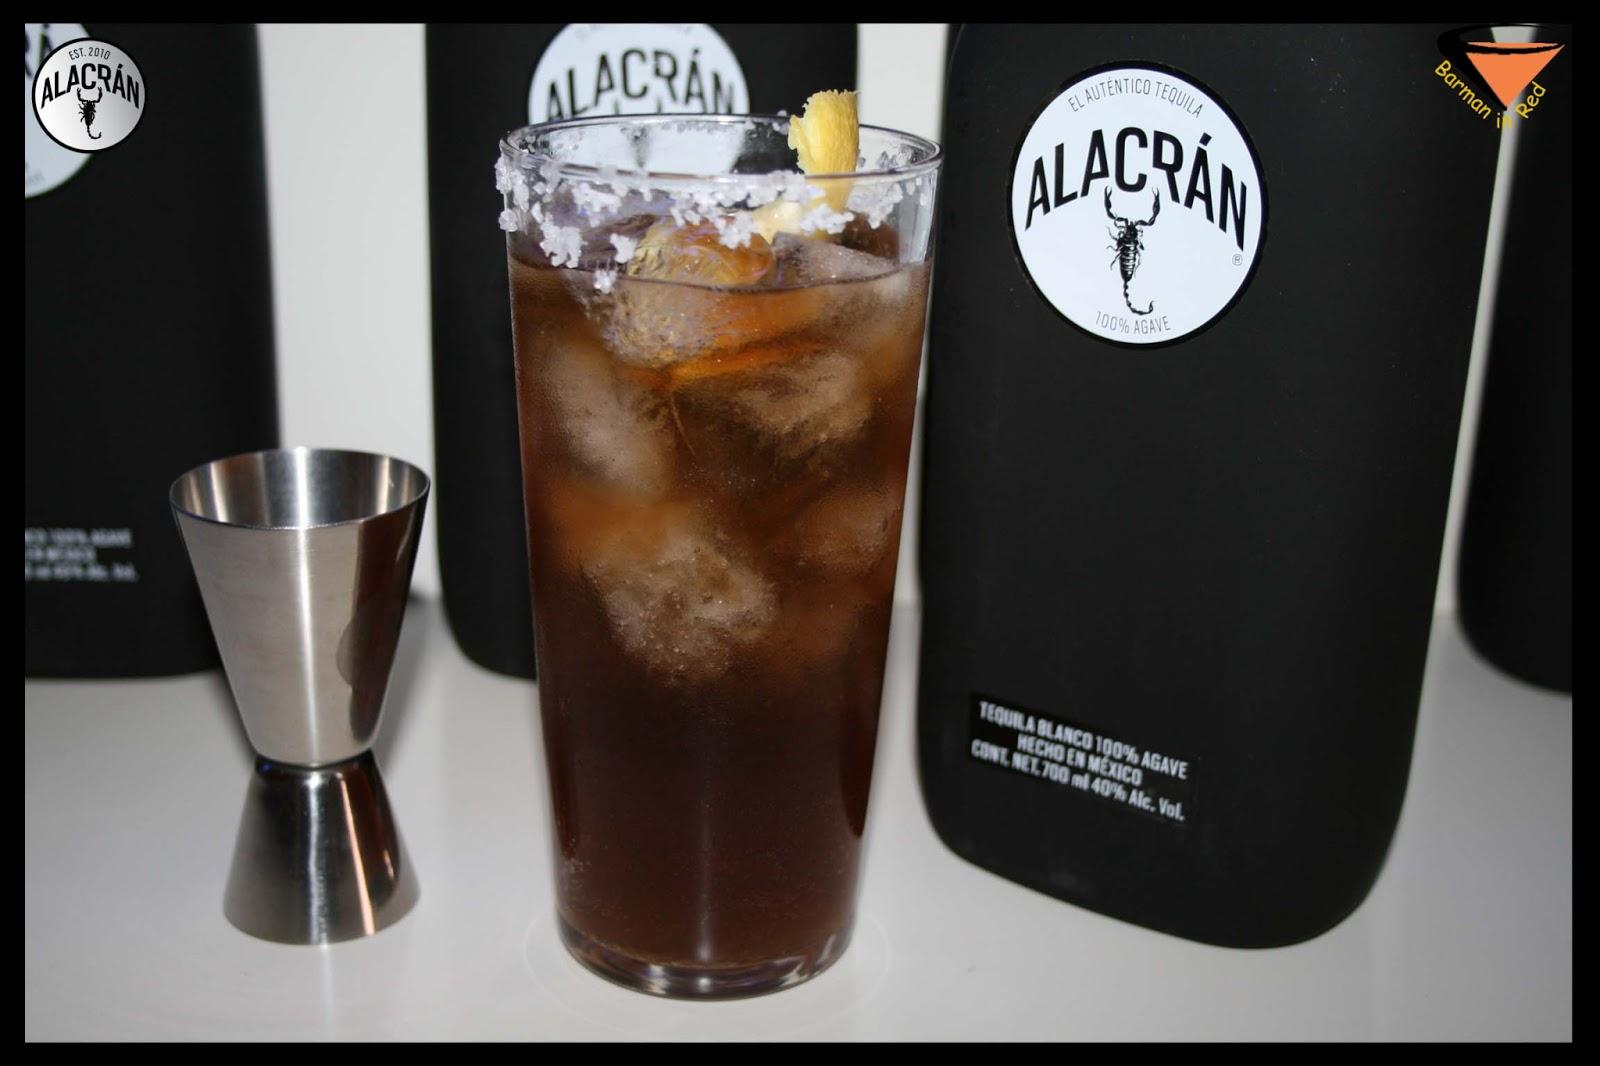 Tequila Alacran